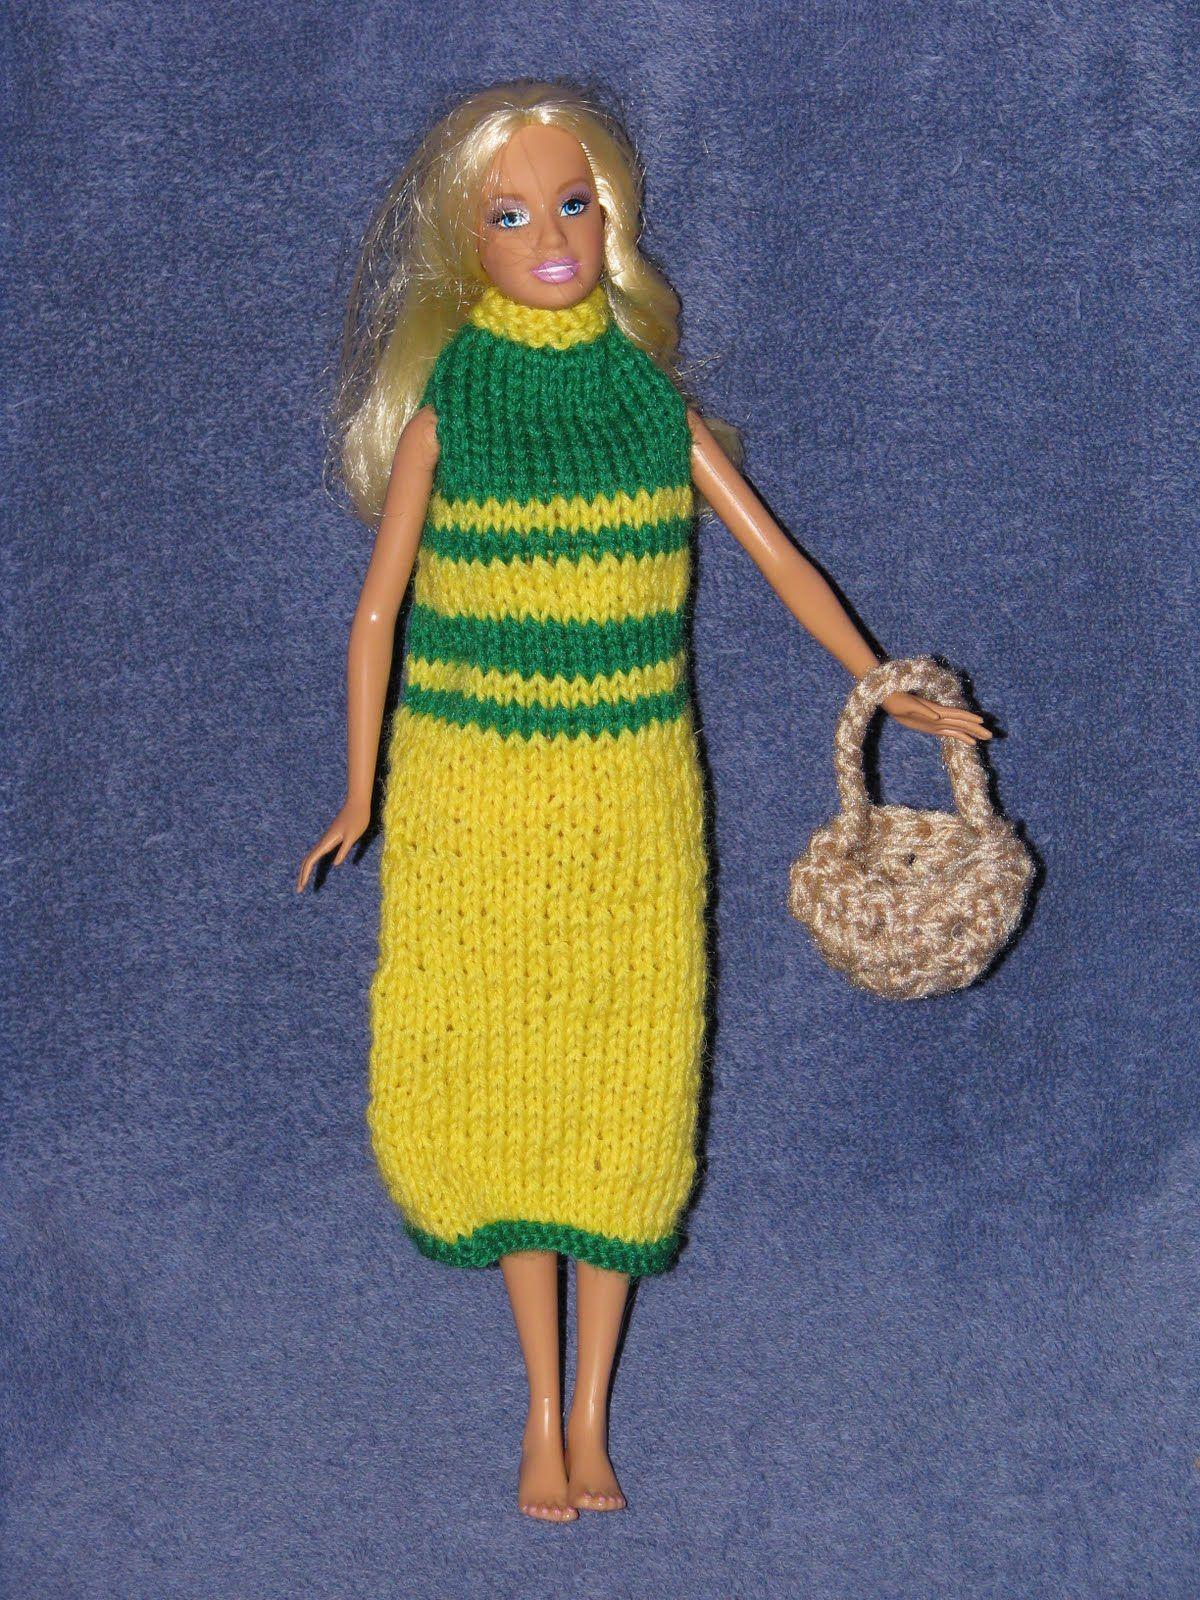 Barbie Collector Dolls: Free Crochet Doll Dress Patterns | BARBIE ...